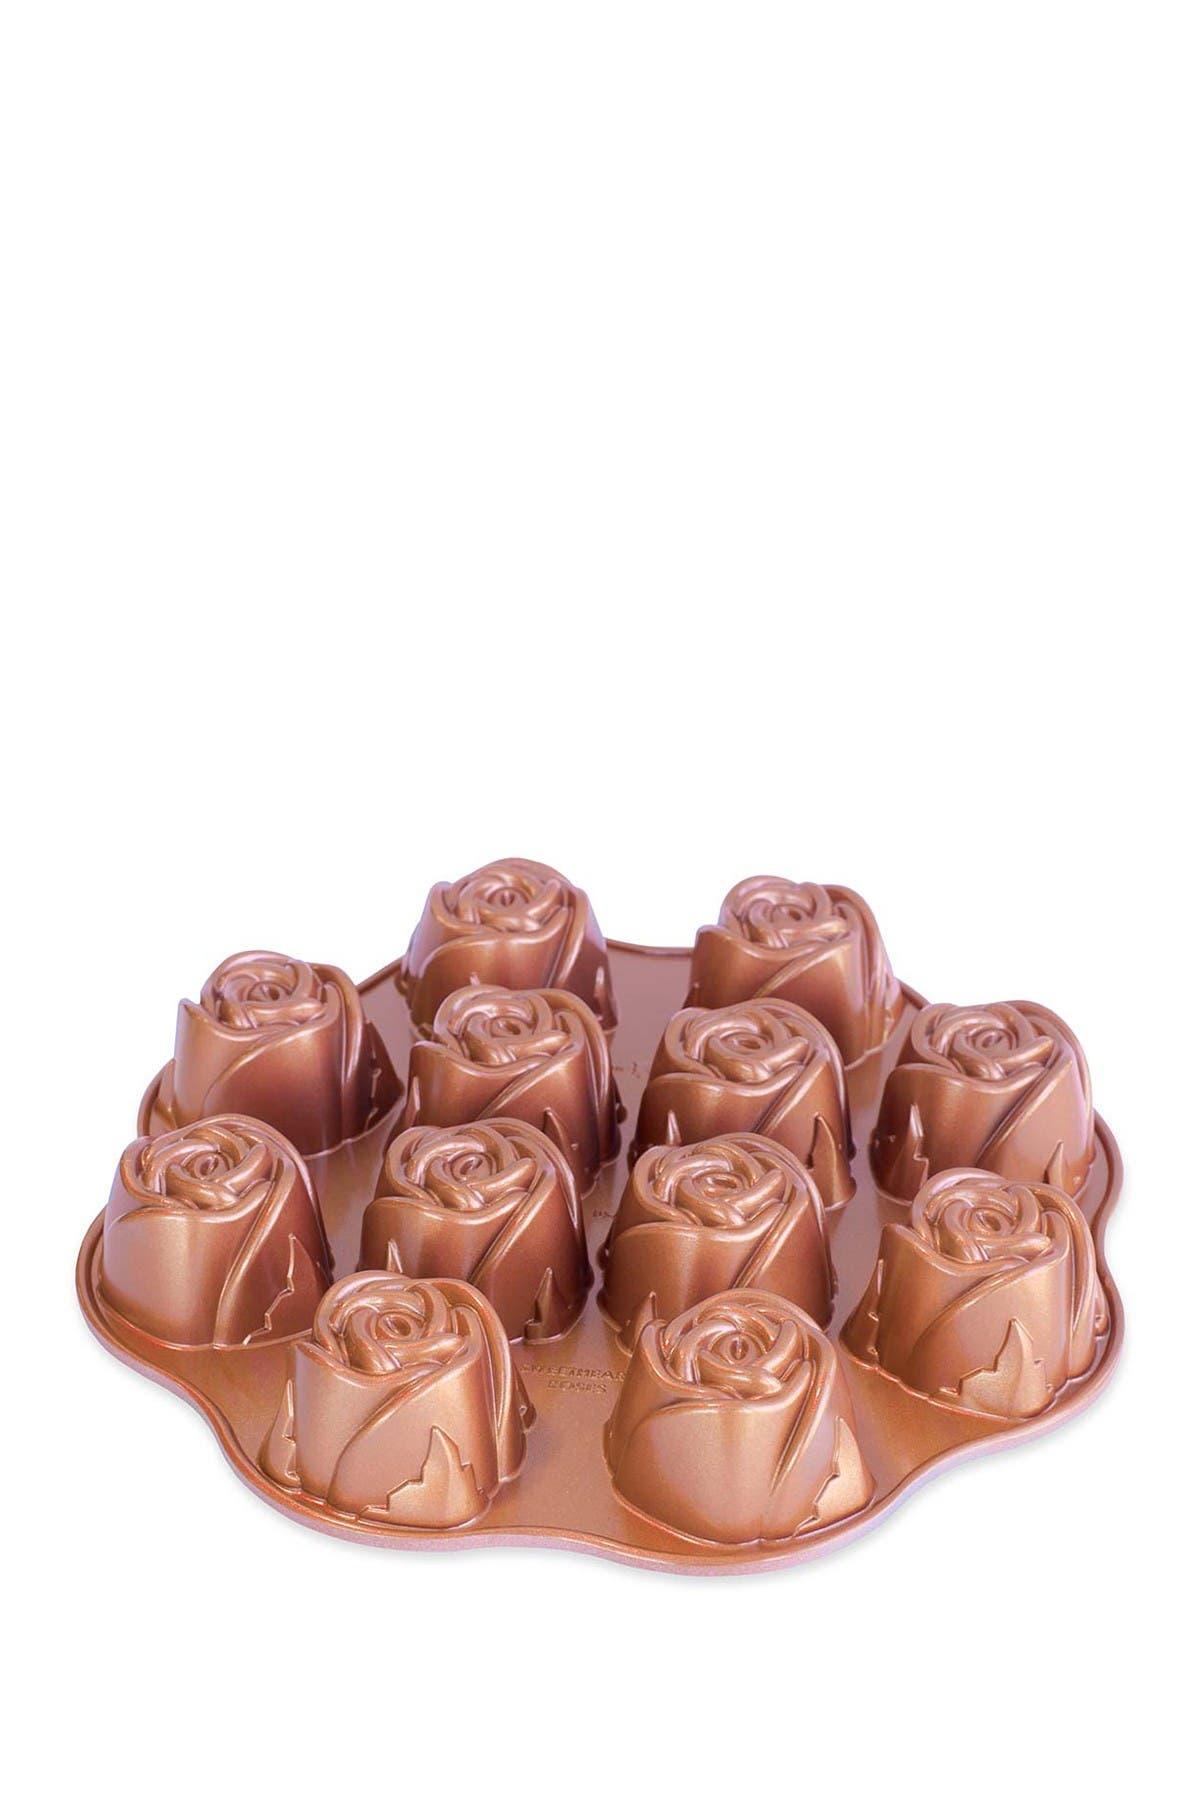 Image of Nordic Ware Sweetheart Rose Pan